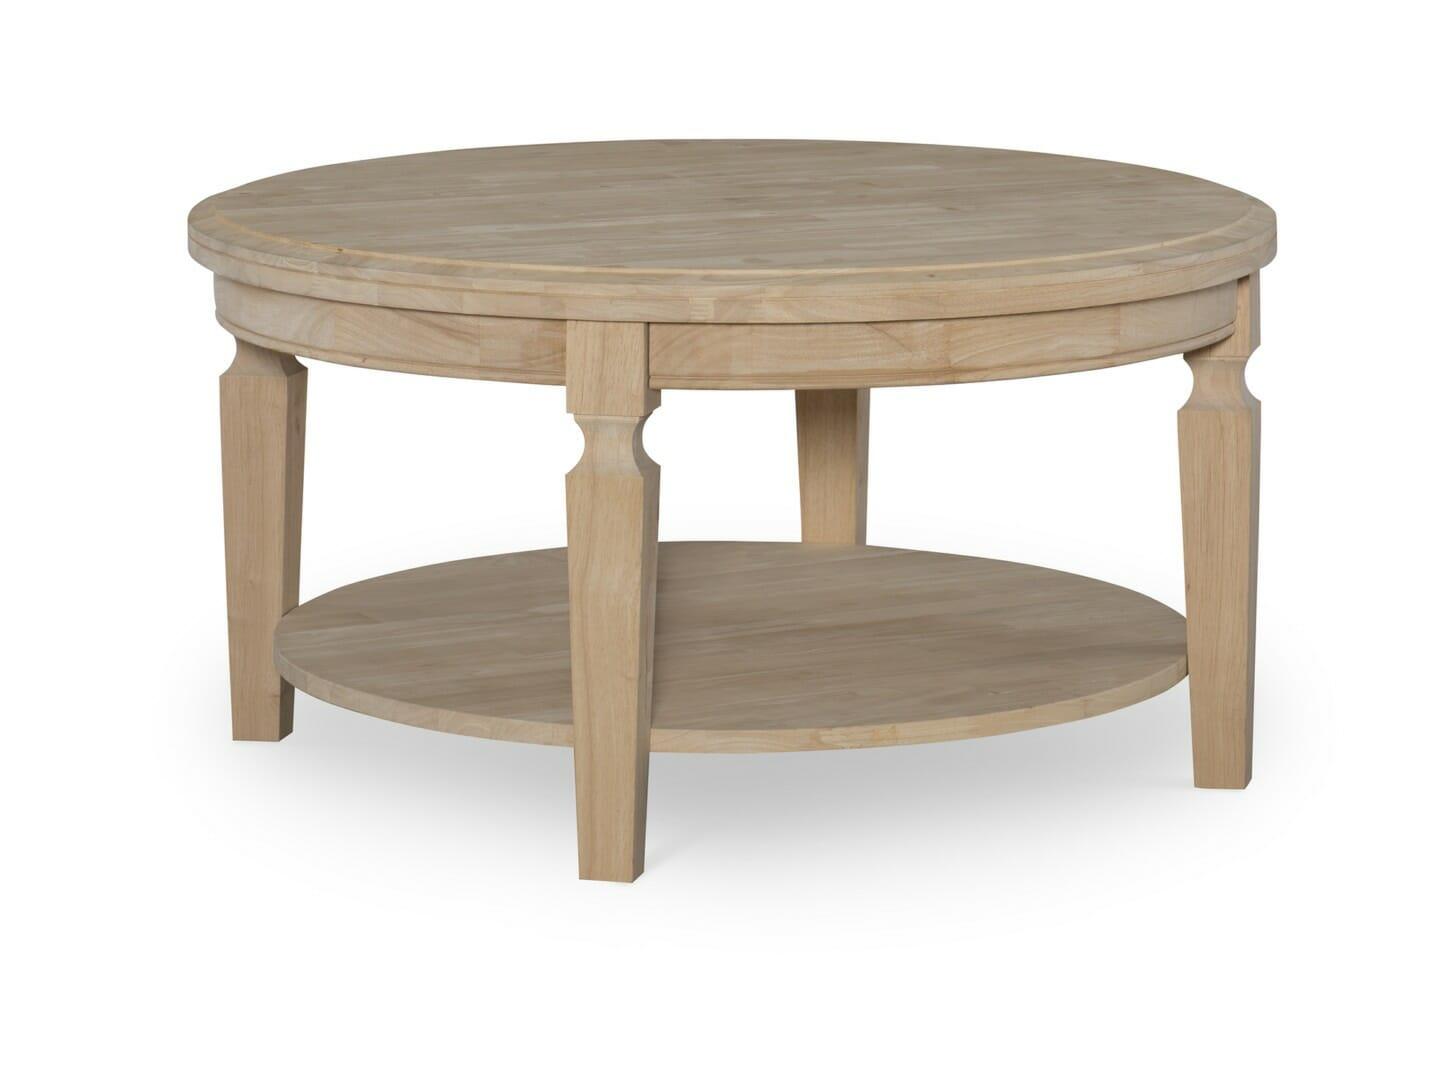 ot 15cr vista round coffee table w free shipping